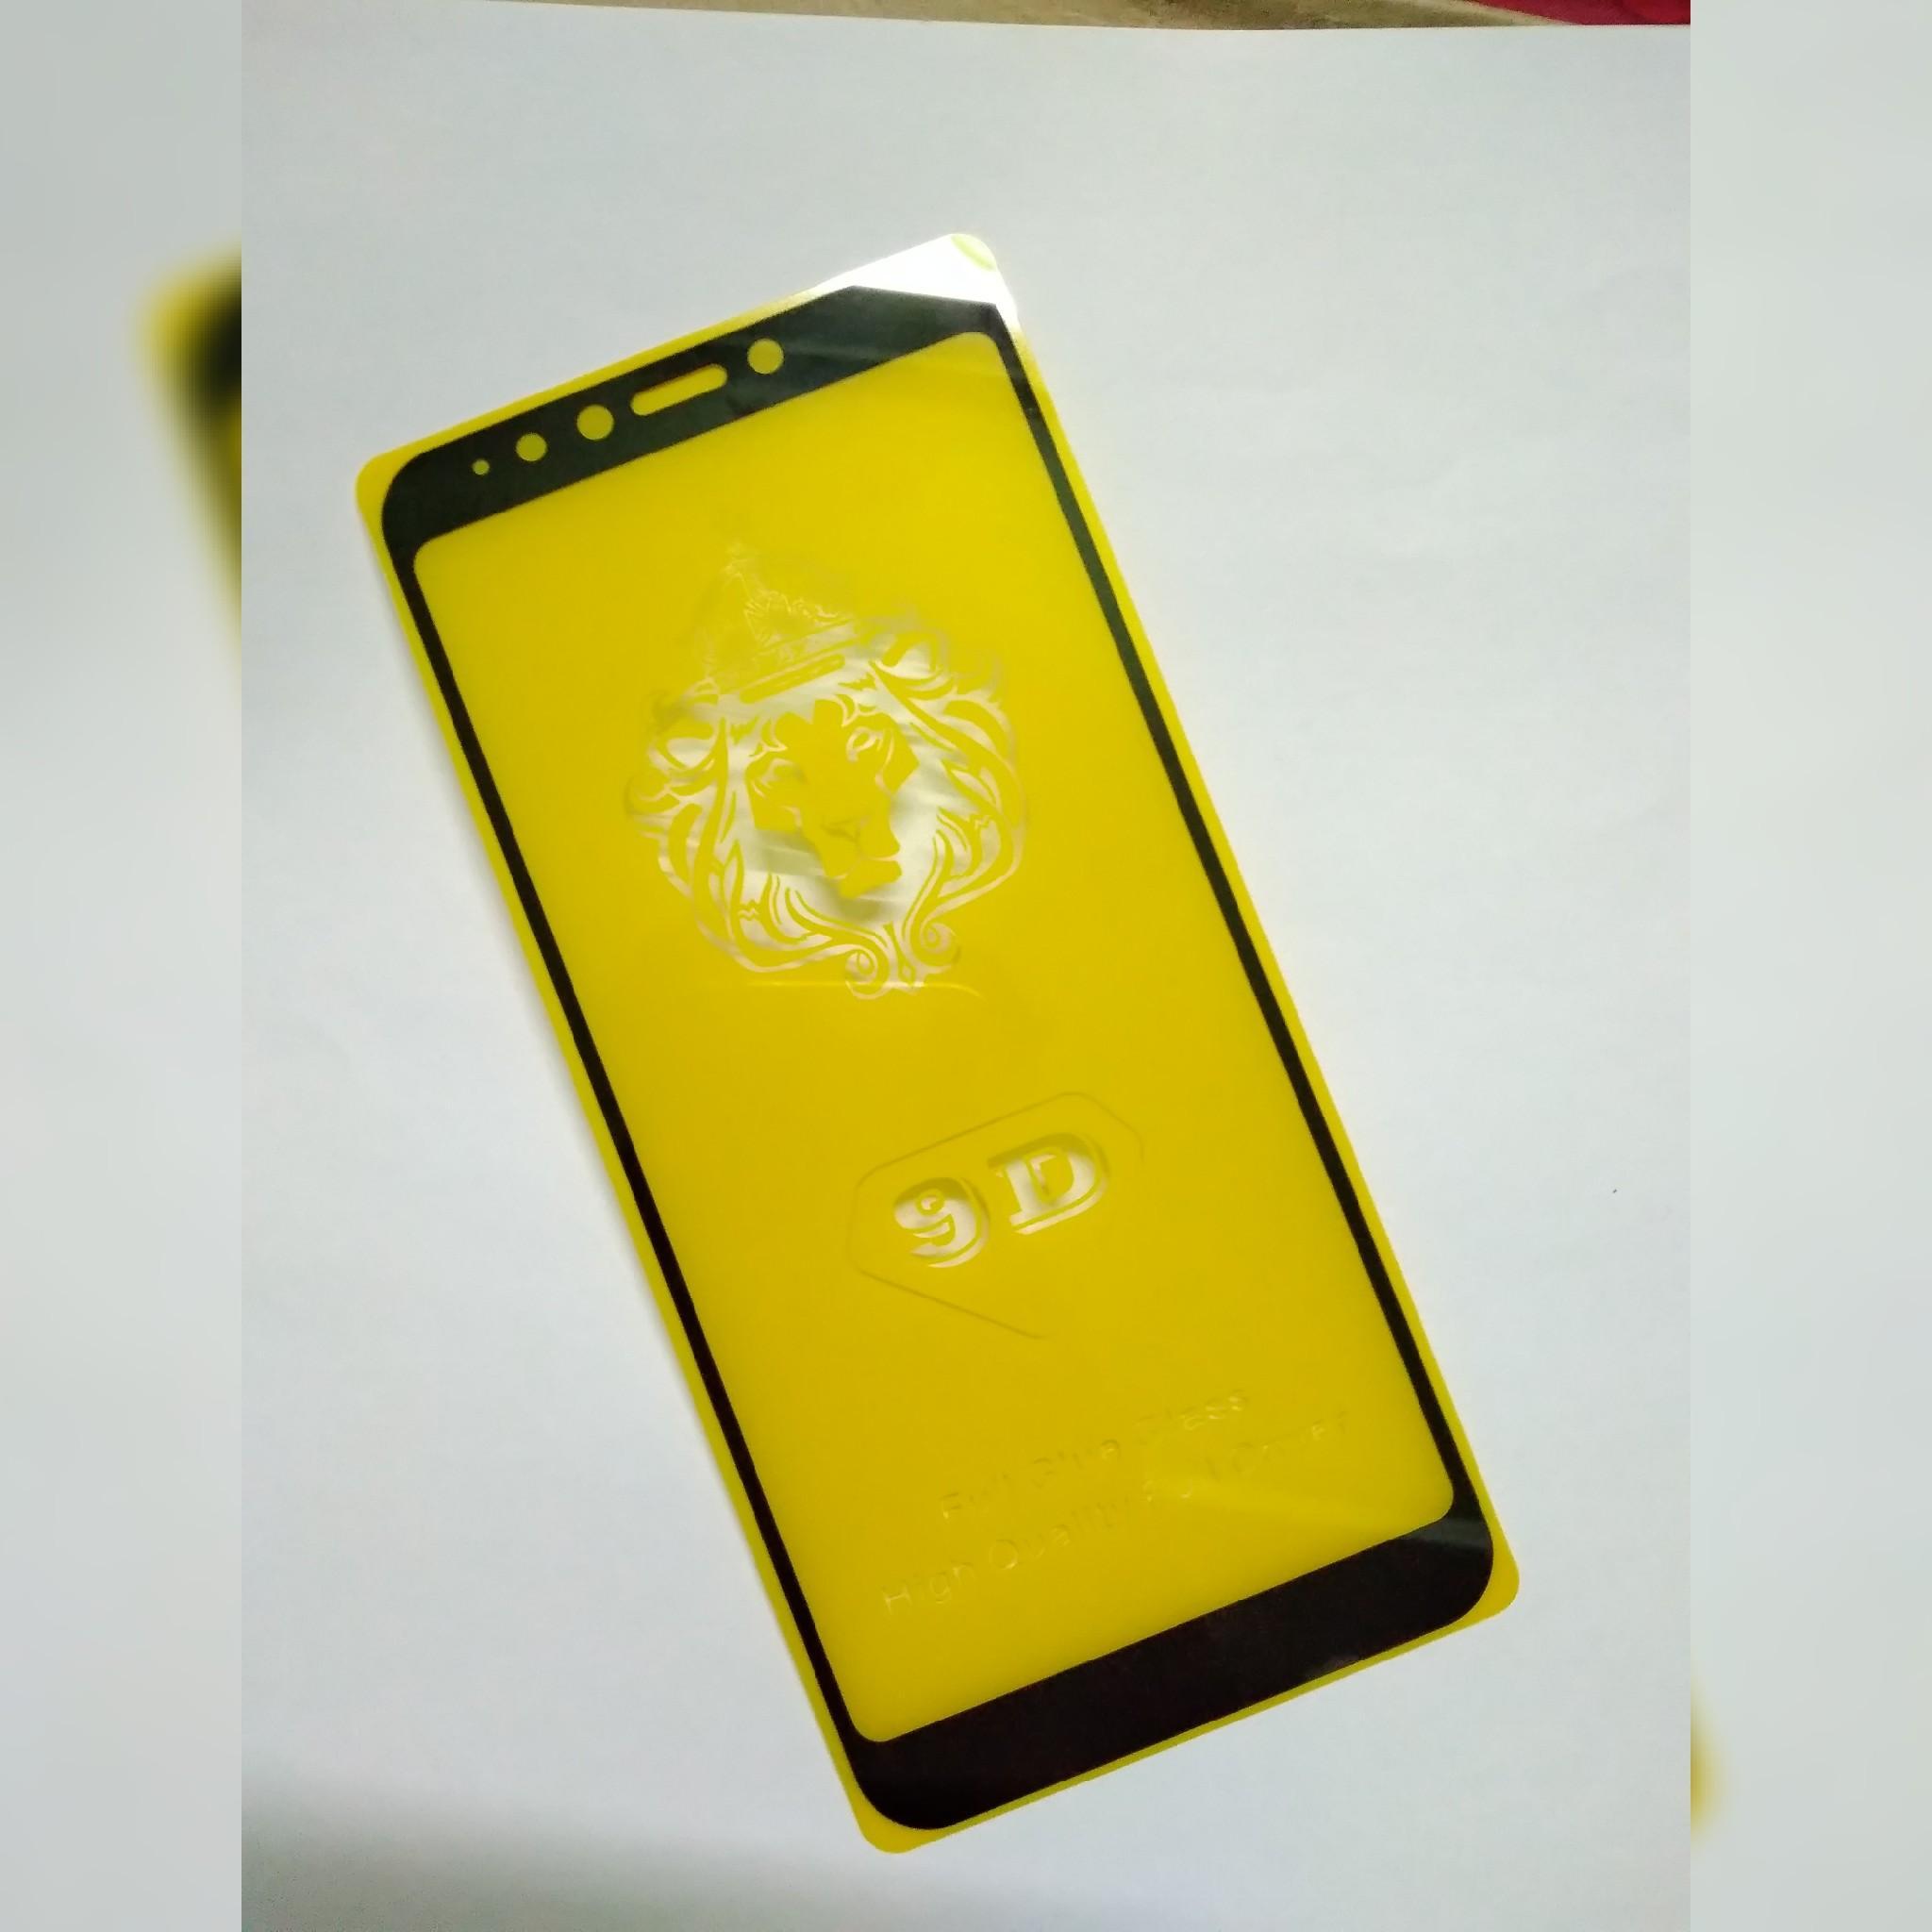 Mobile Phone Accessories In Bangladesh At Best Price - Daraz com bd